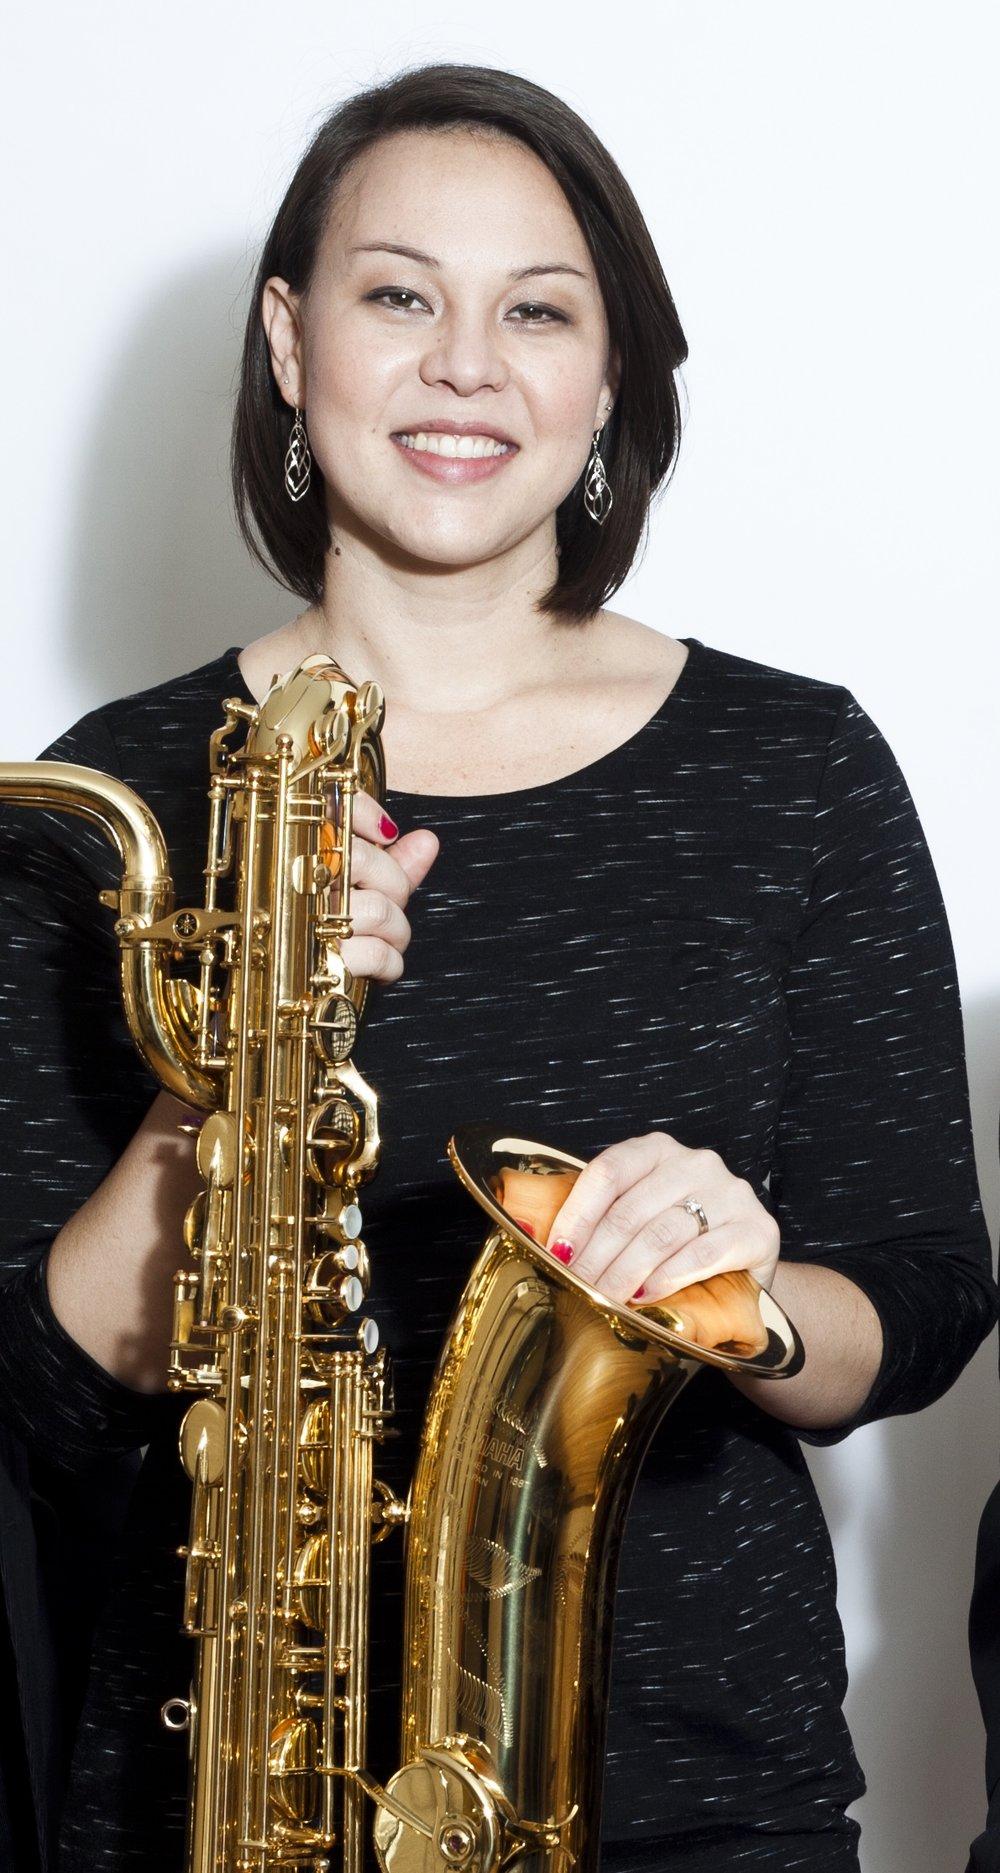 Kimberly Goddard Loeffert - baritone saxophone